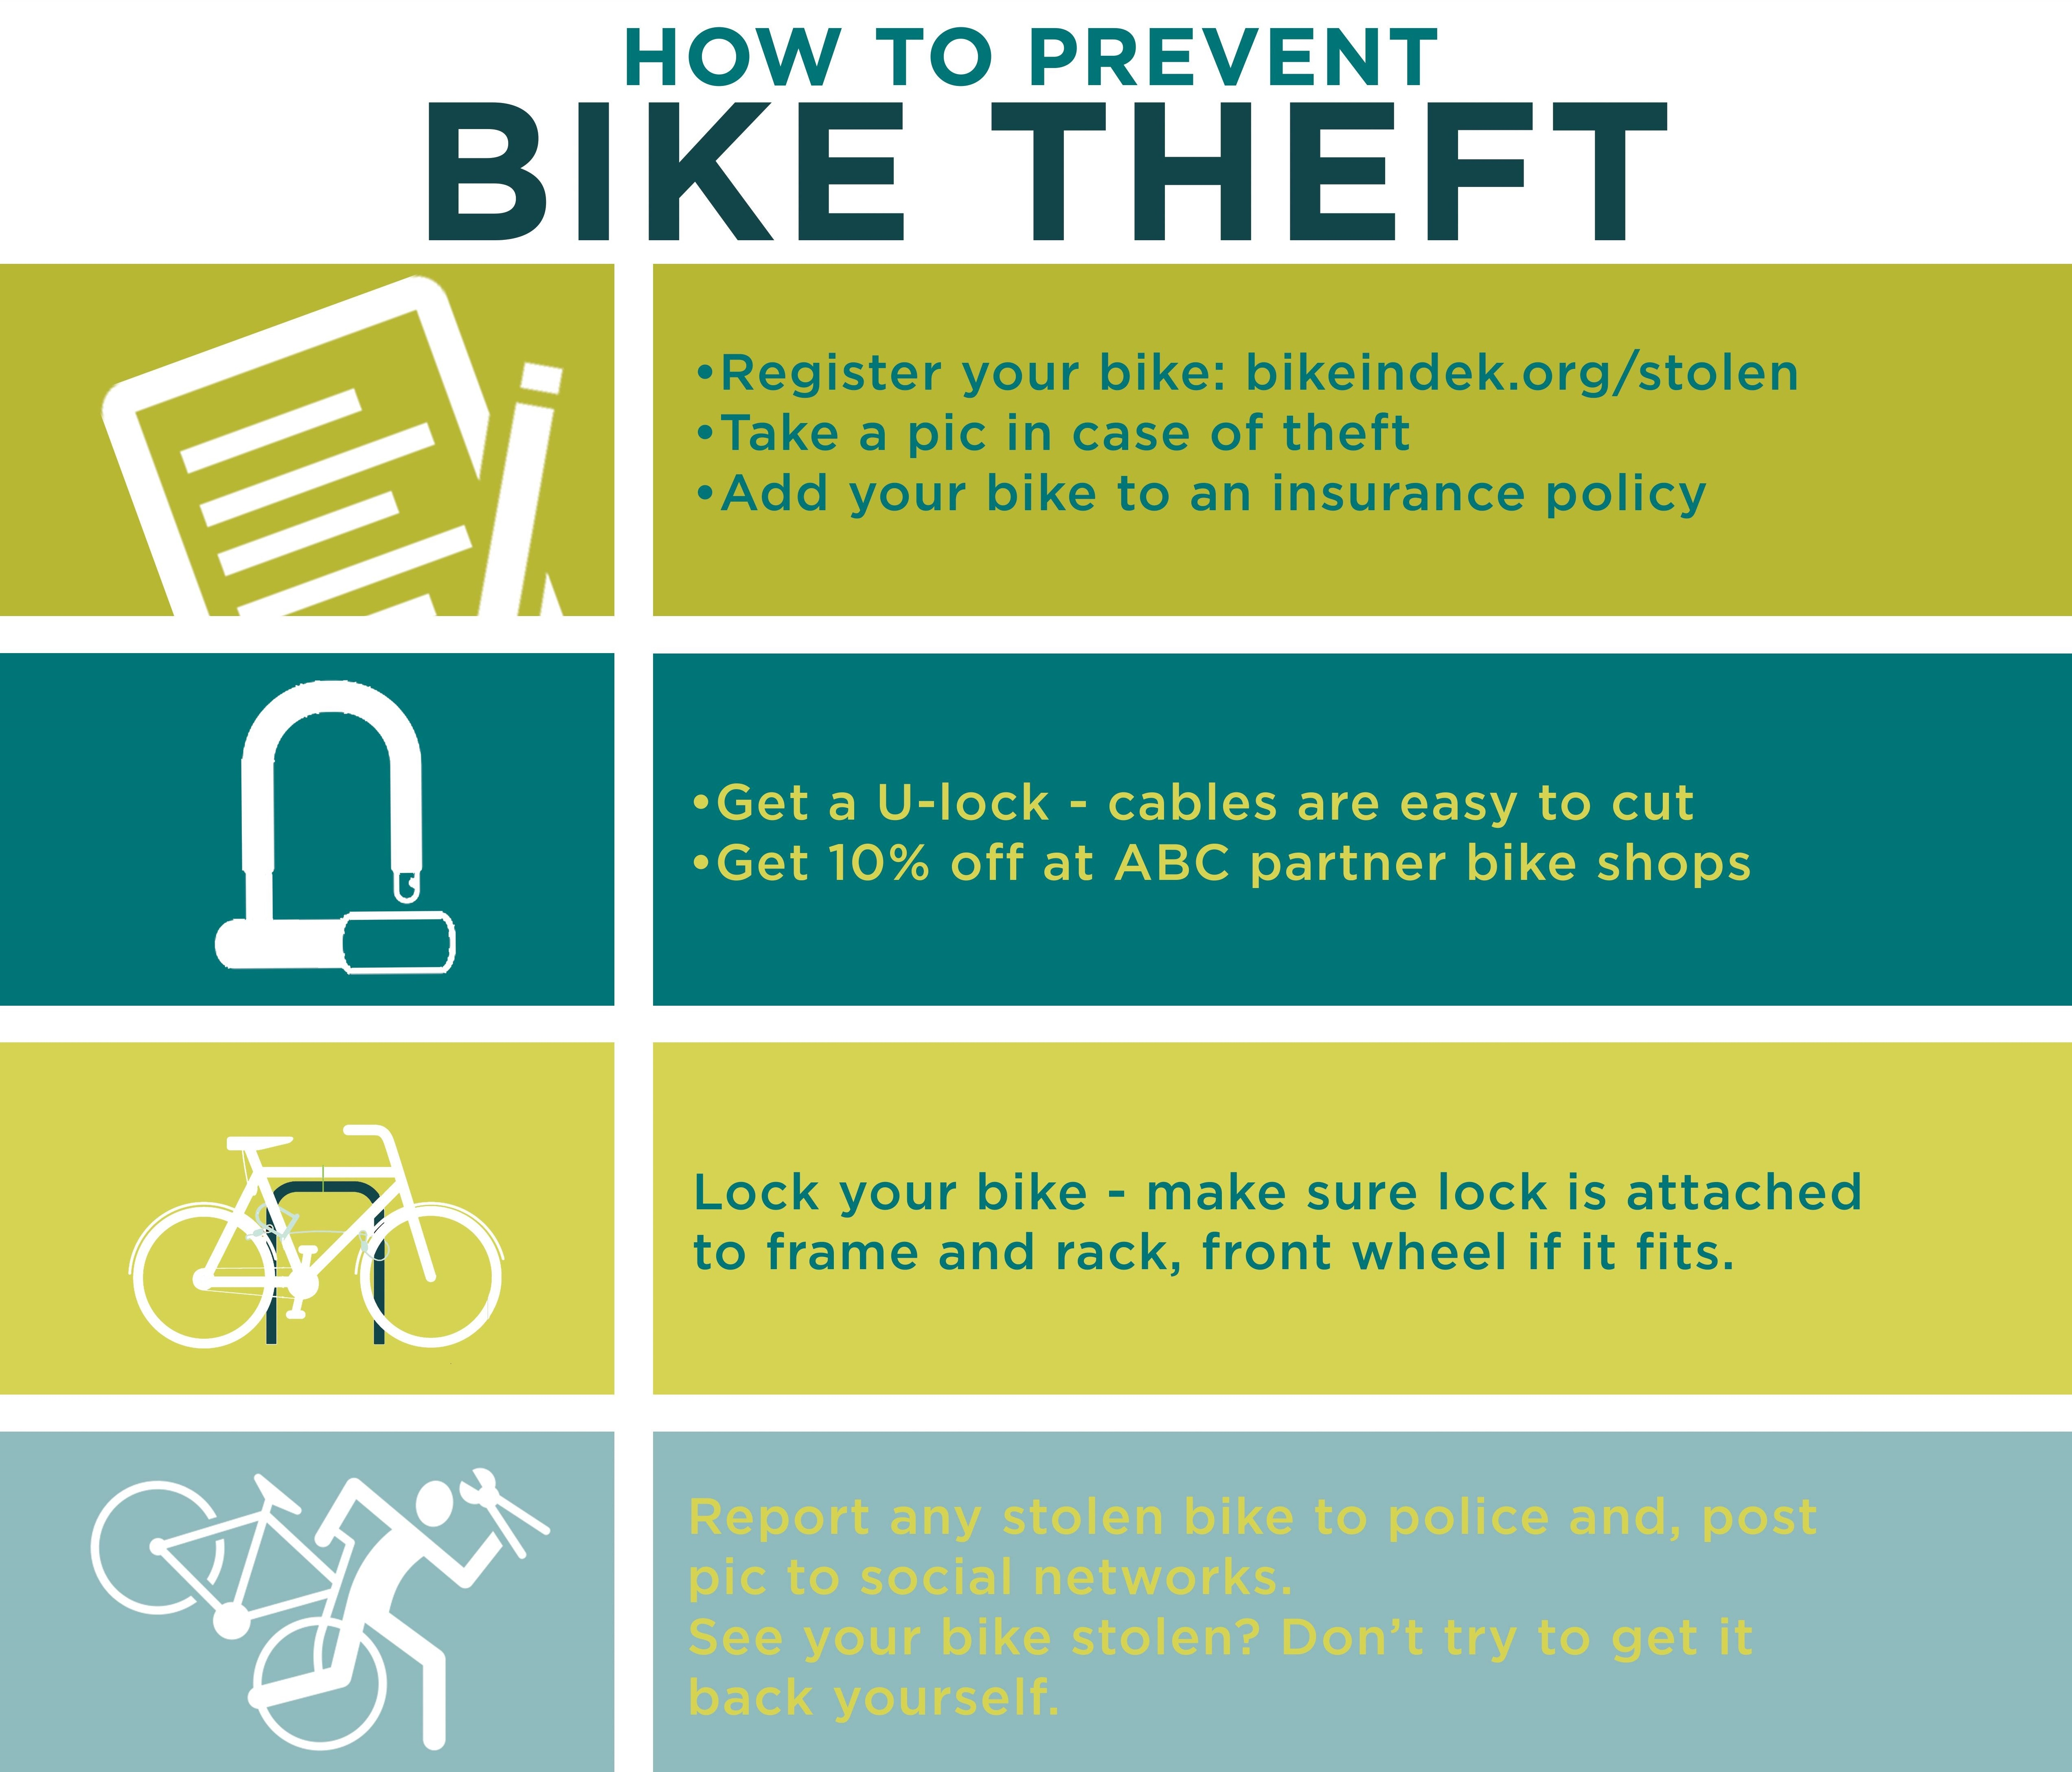 prevent_theft.jpg